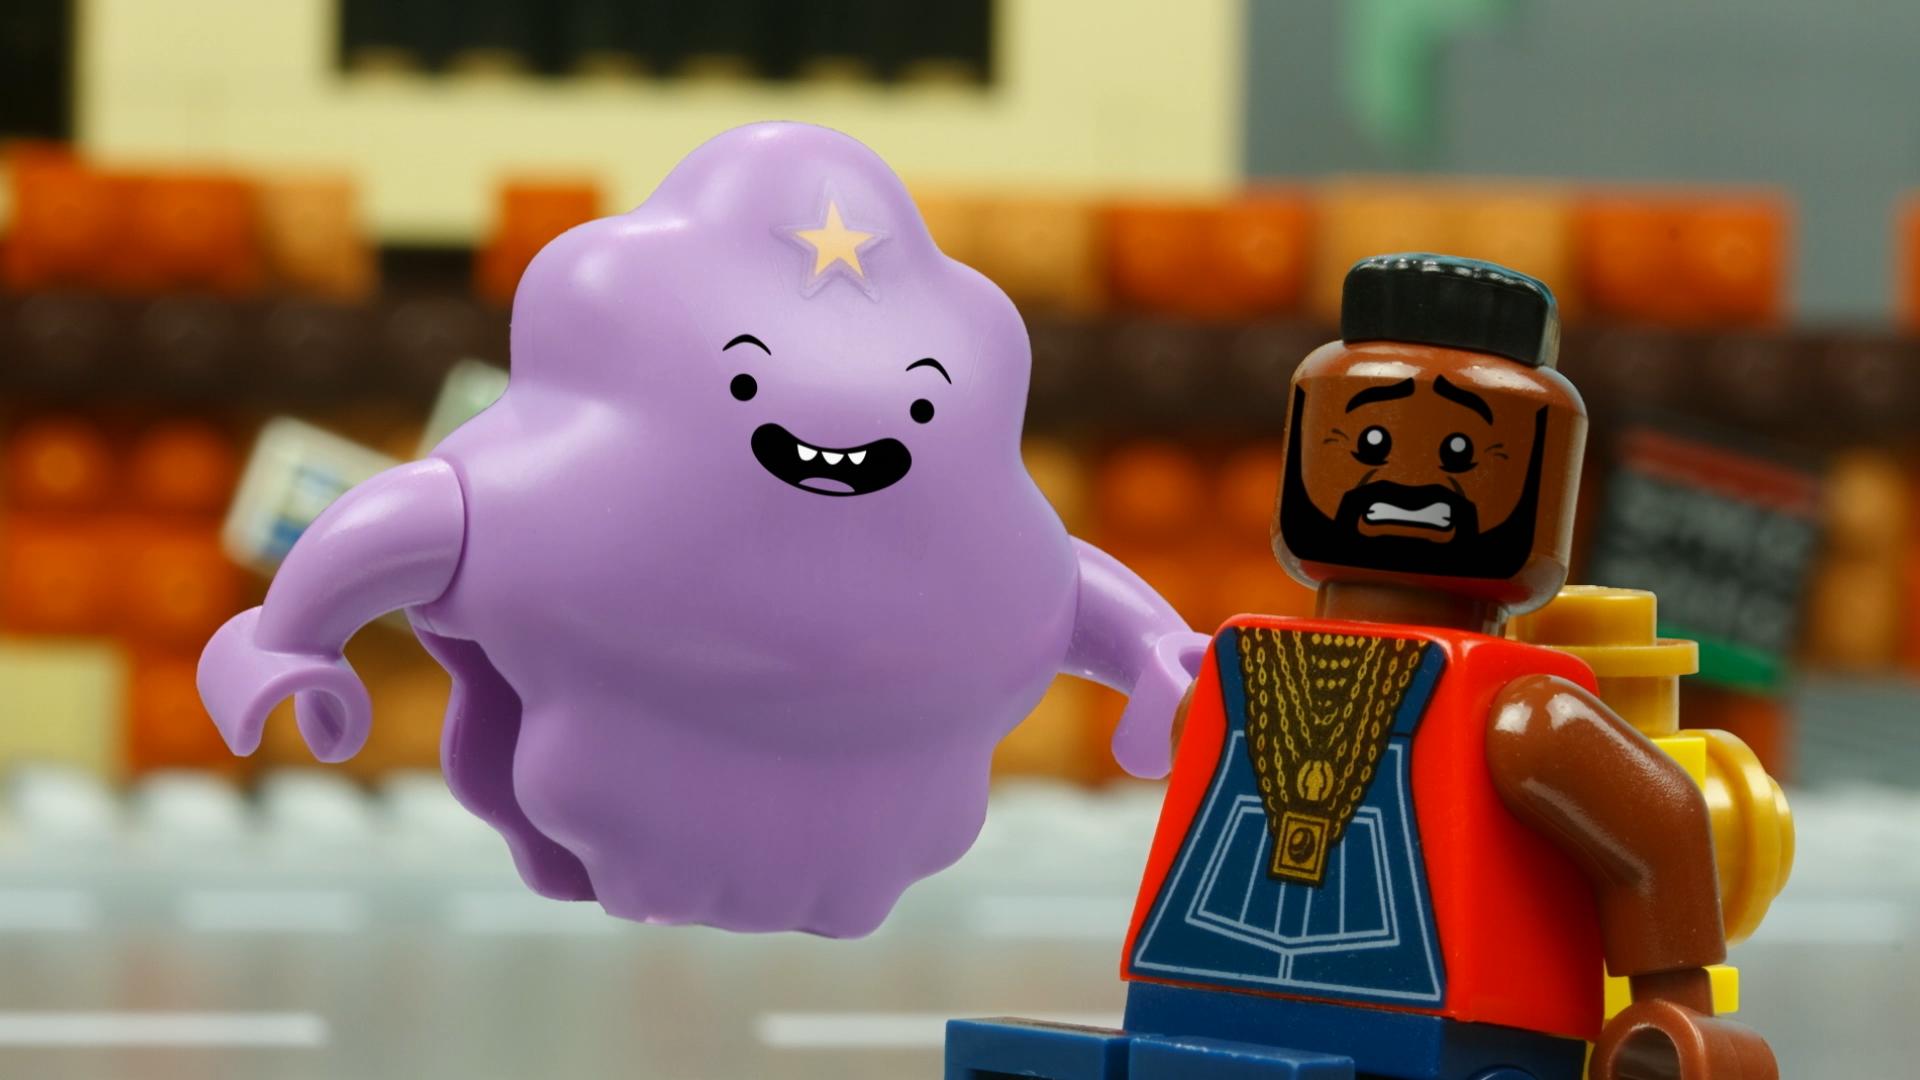 LEGO Dimensions: Lumpy Space Princess Meets B.A. Baracus